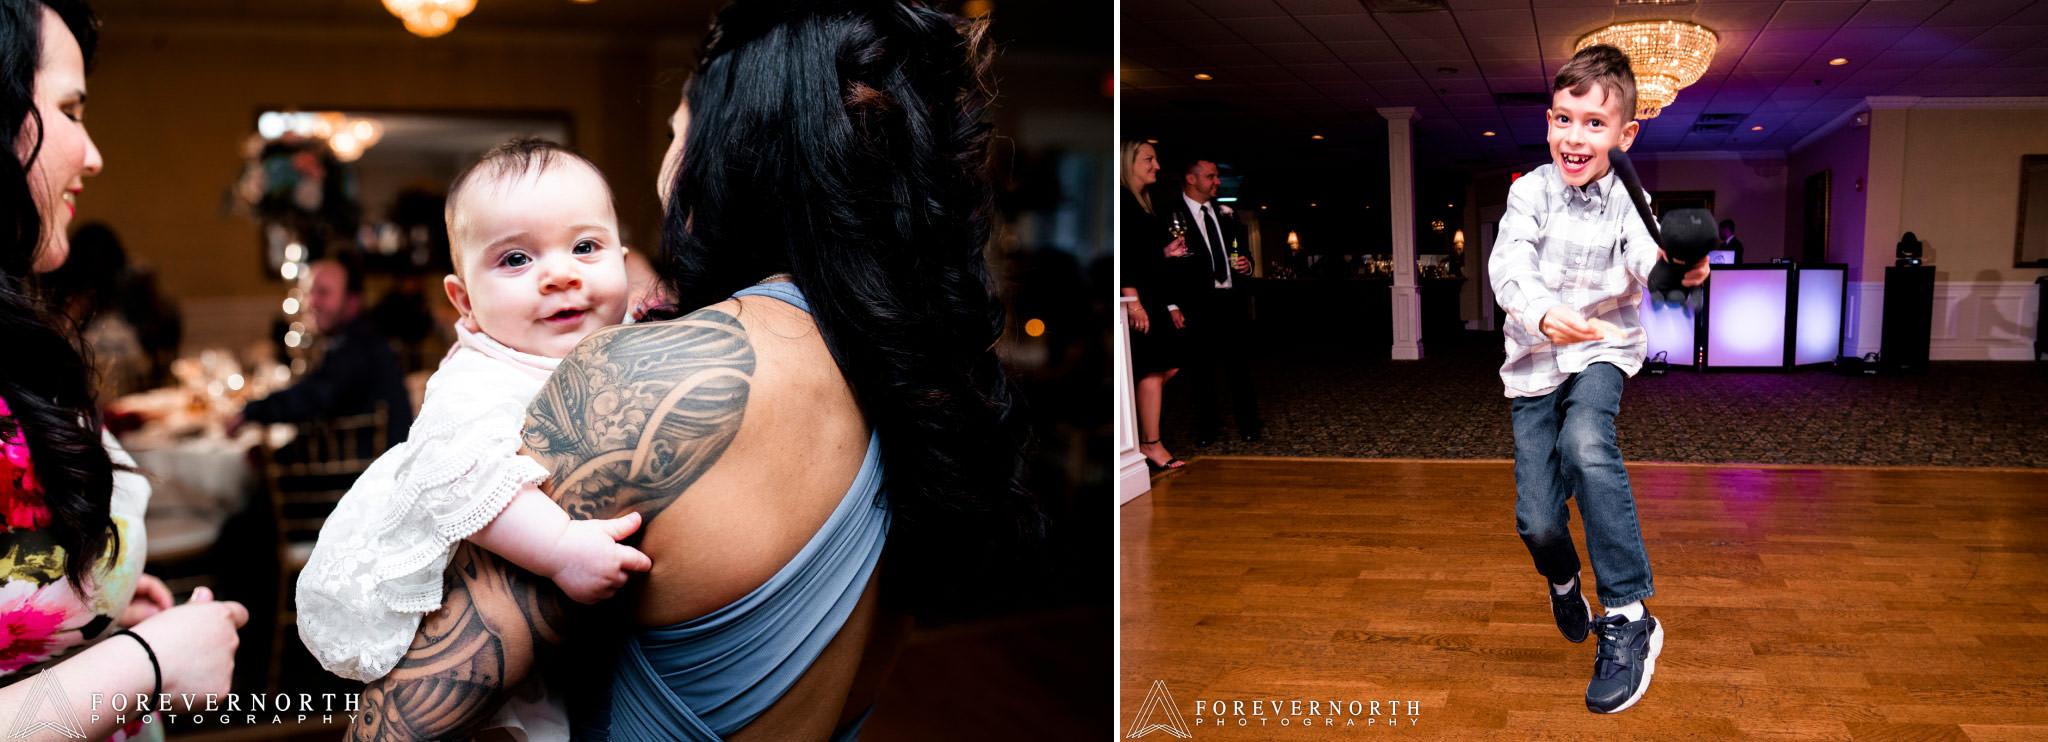 Rivera-Bradford-Estate-Wedding-Photographer-04.JPG